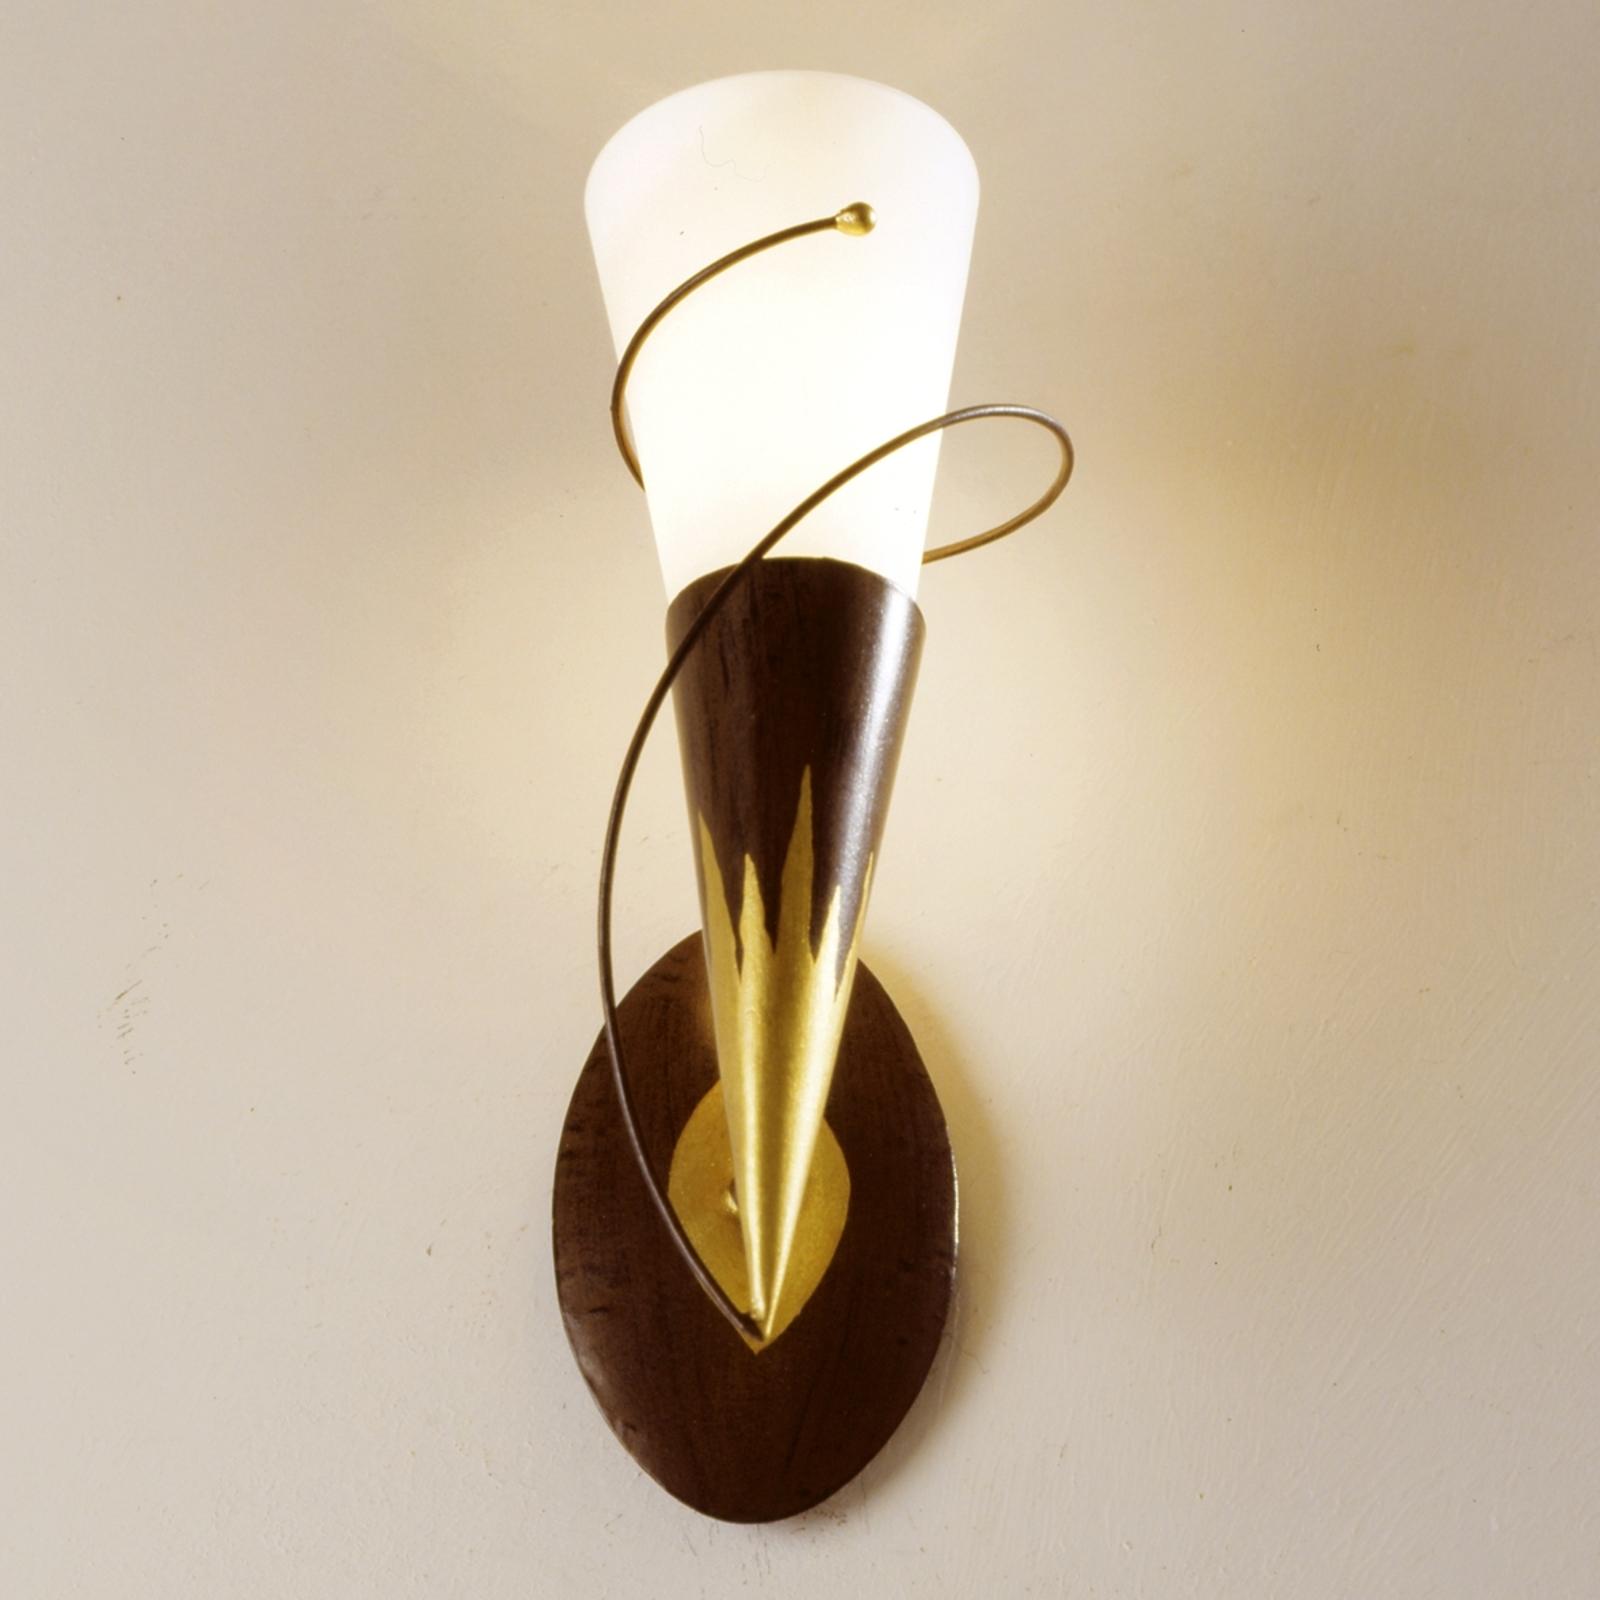 Single-bulb wall lamp Torcia Spirale_4512383_1